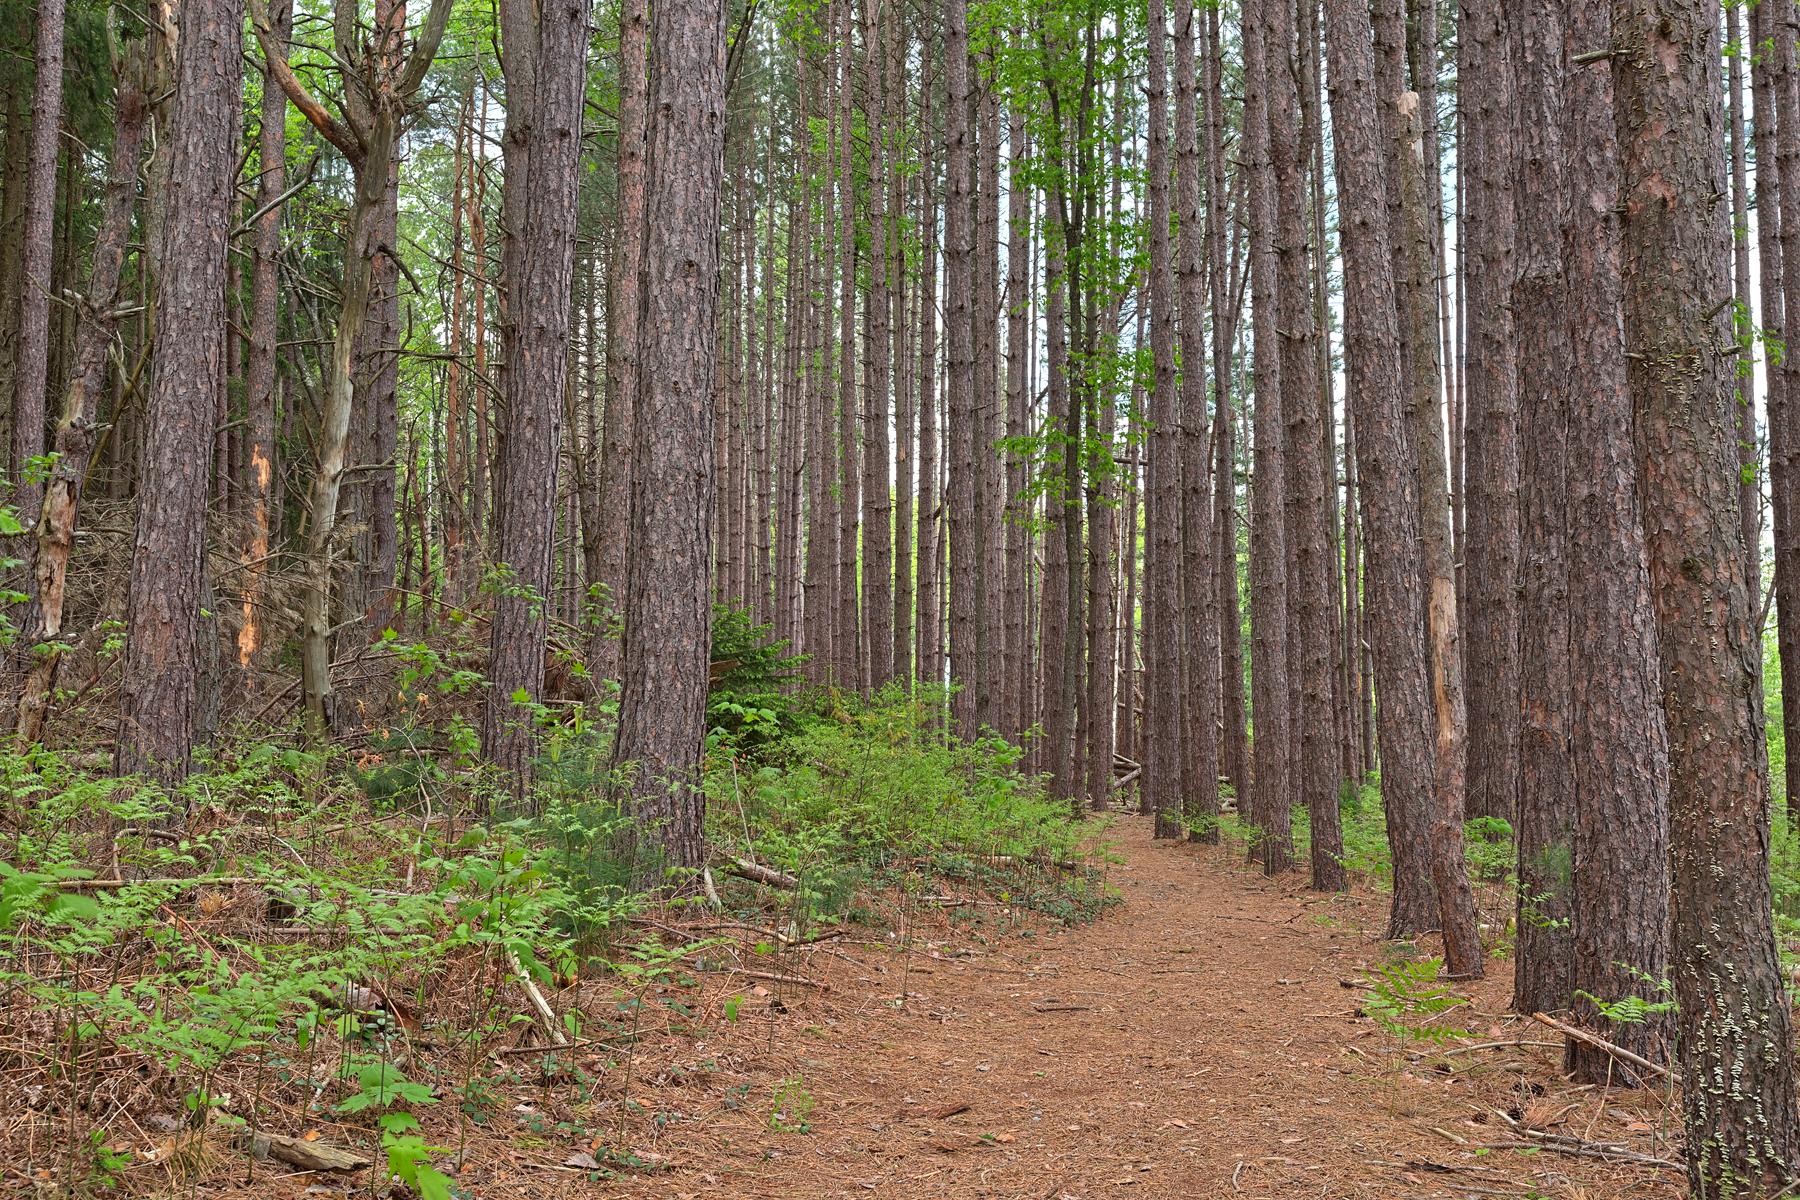 Cranesville swamp pine trail - hdr photo